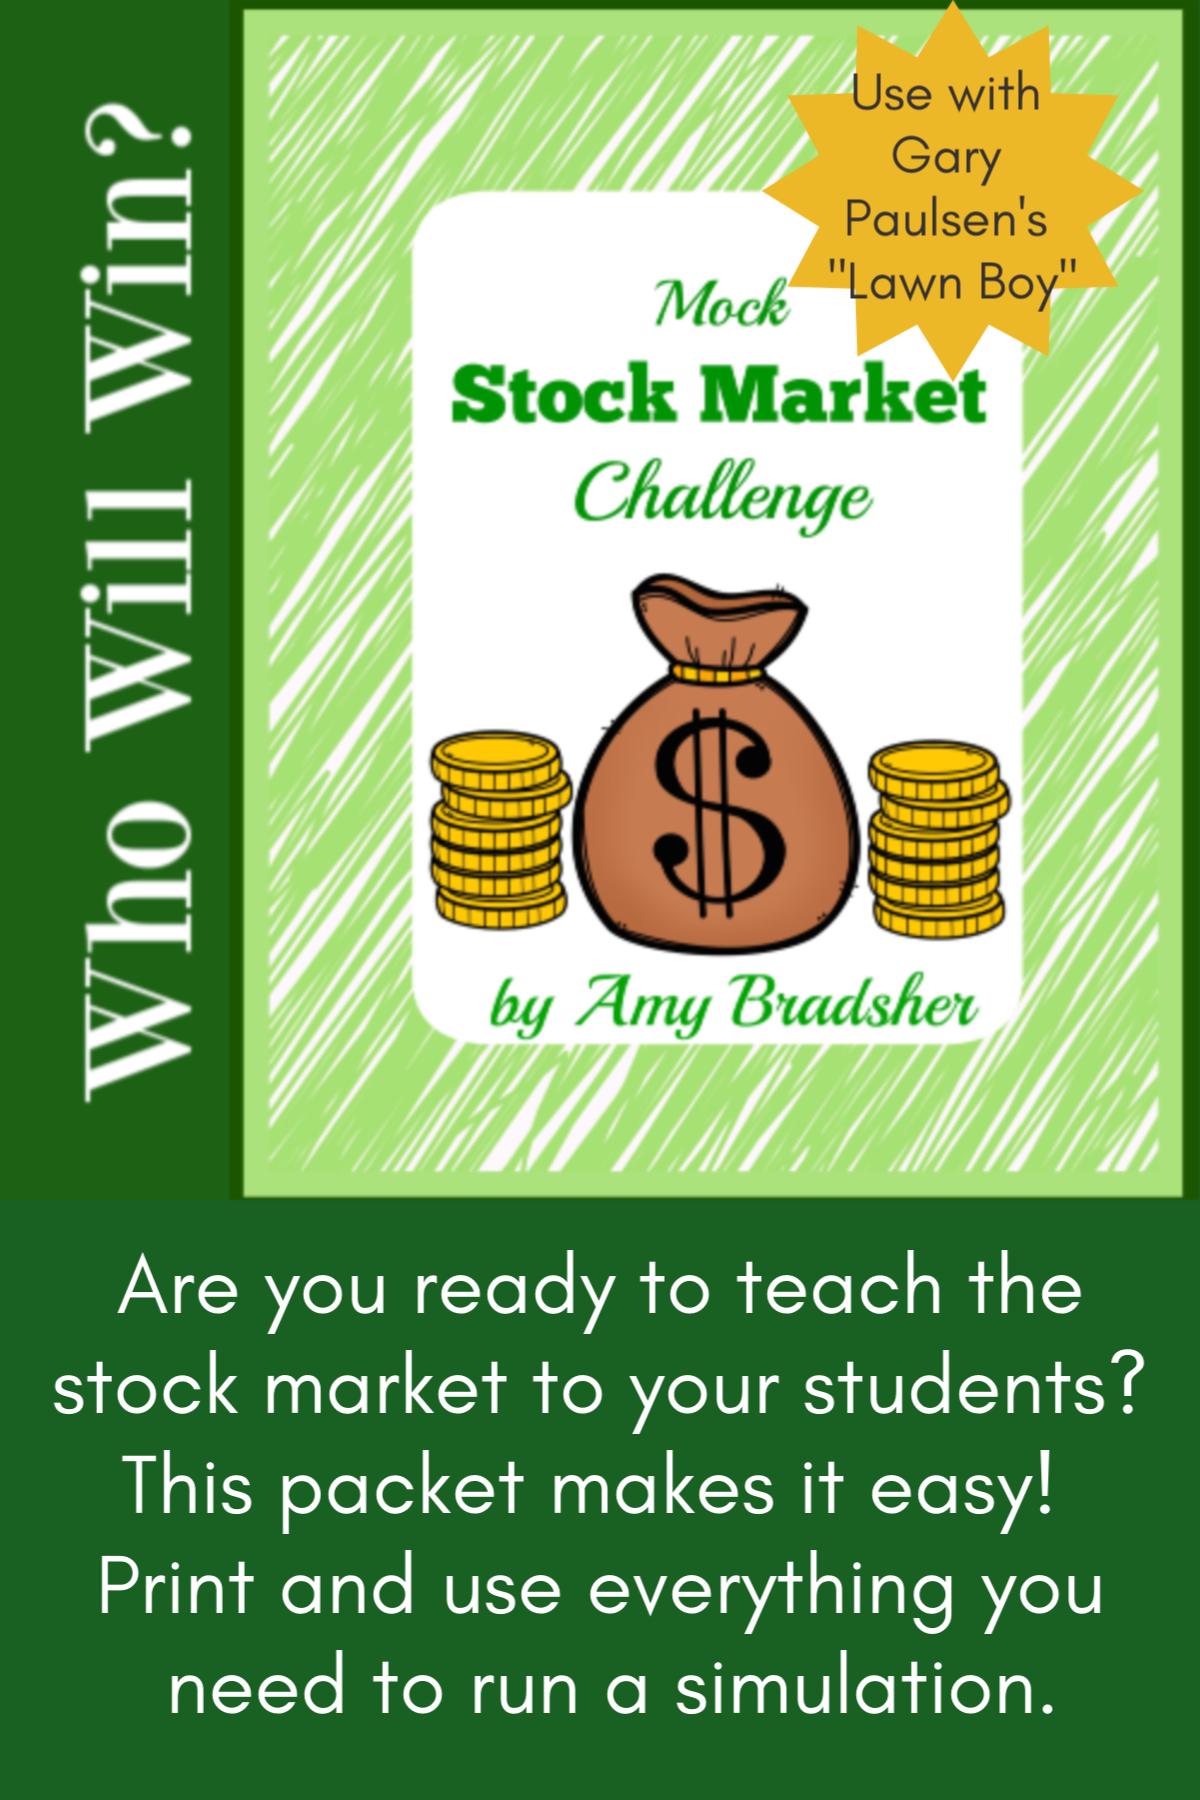 Stock Market Simulation Challenge